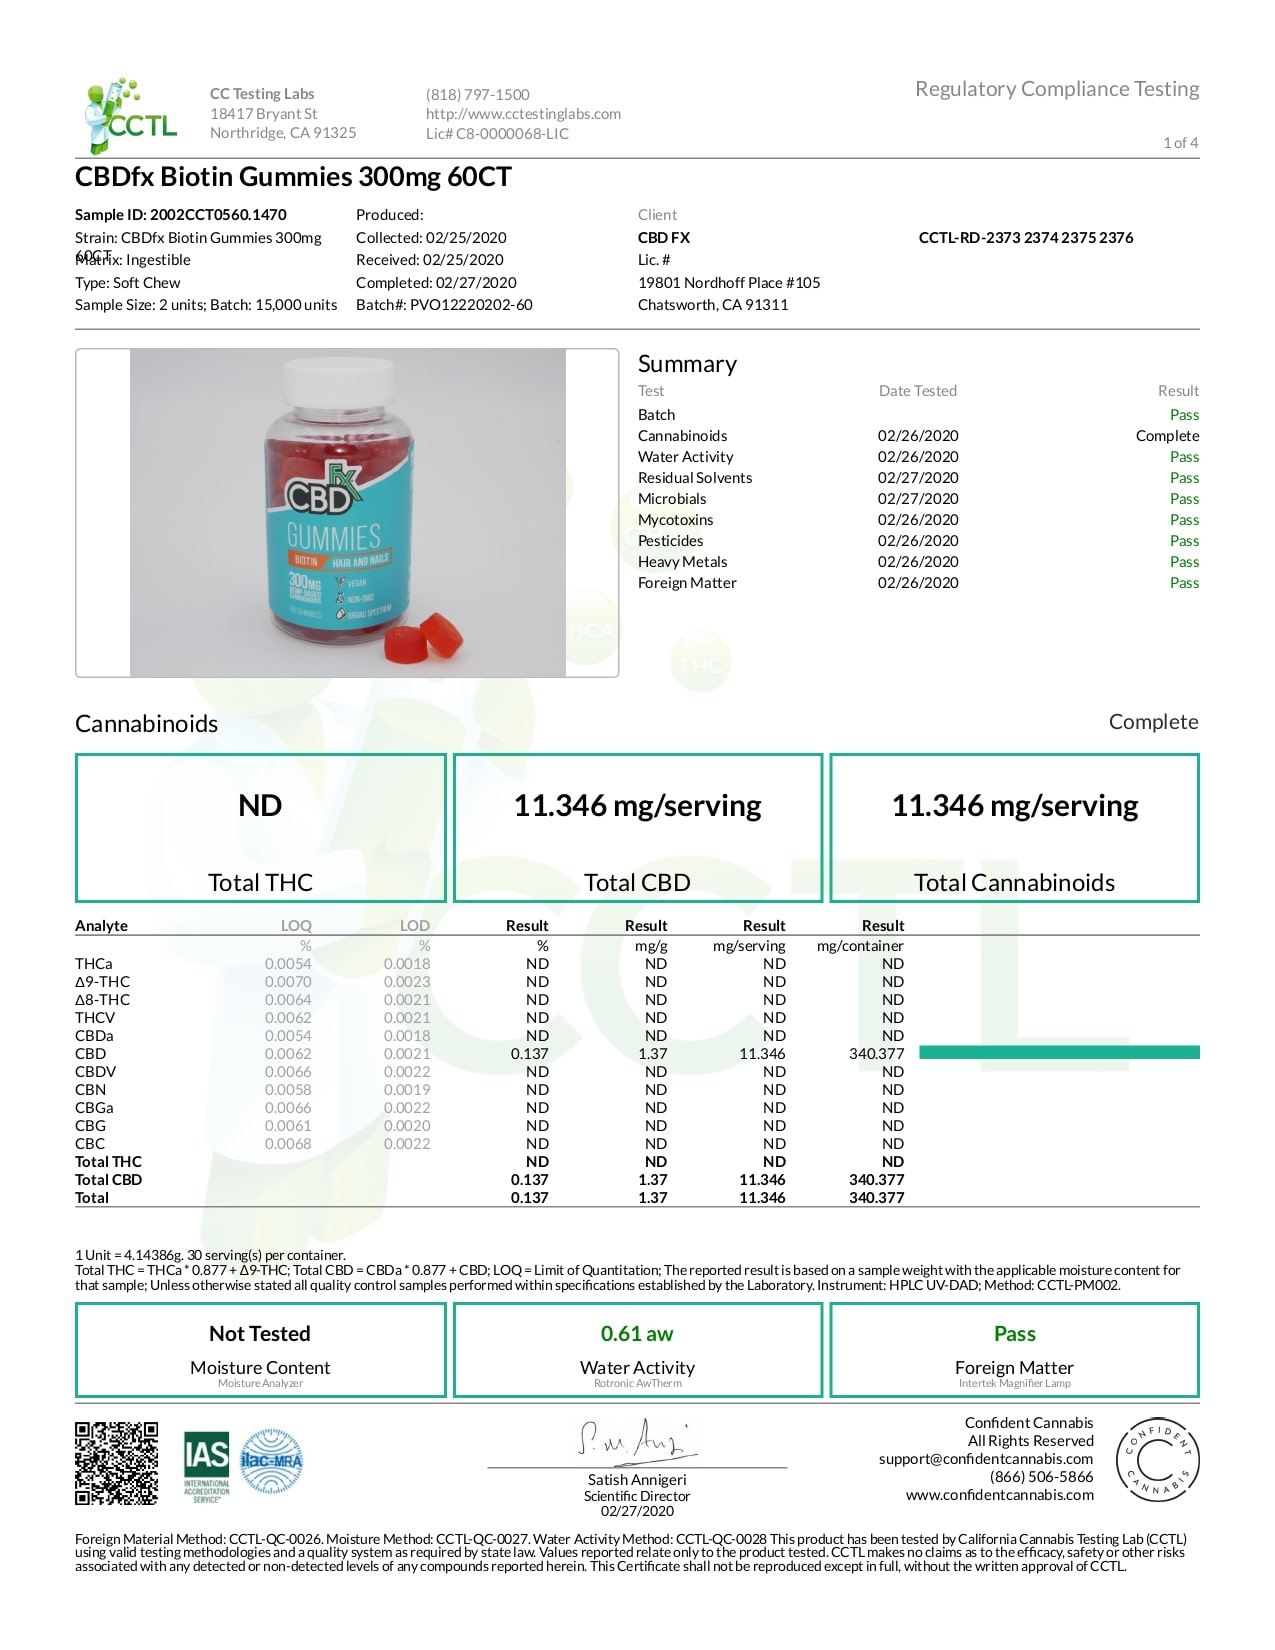 CBDfx CBD Gummies with Biotin Lab Report Broad Spectrum 300mg